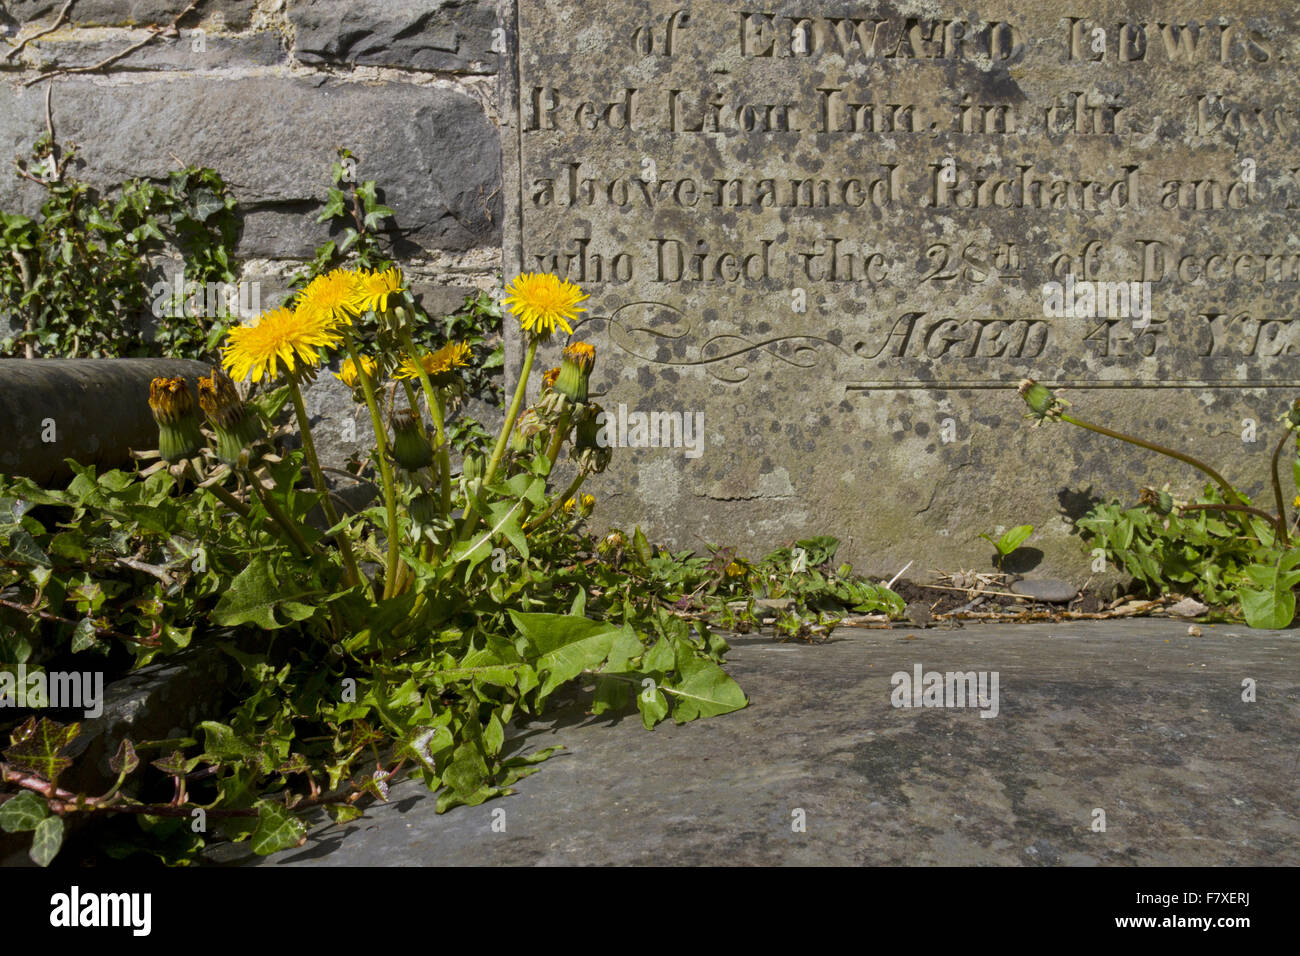 Common Dandelion (Taraxacum officinalis) flowering, growing between stone slab beside gravestone in church graveyard, - Stock Image